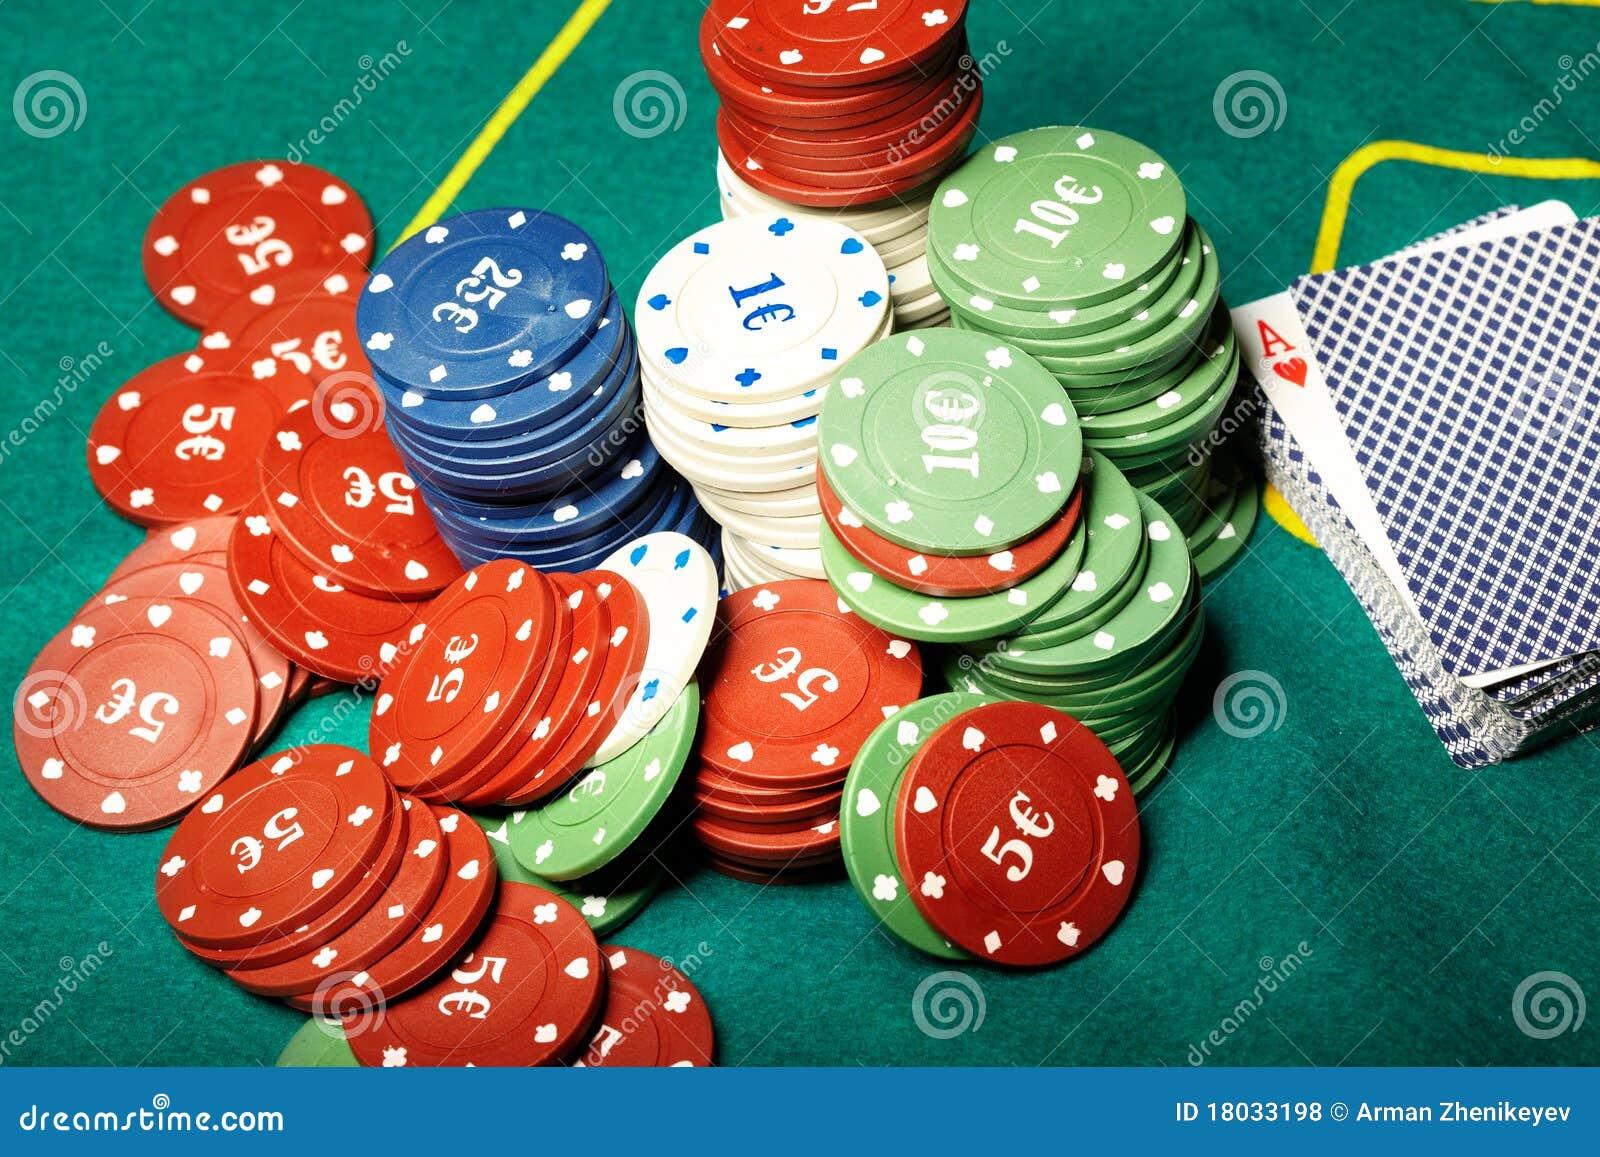 Poker stock photo  Image of bank, chip, game, bonanza - 18033198